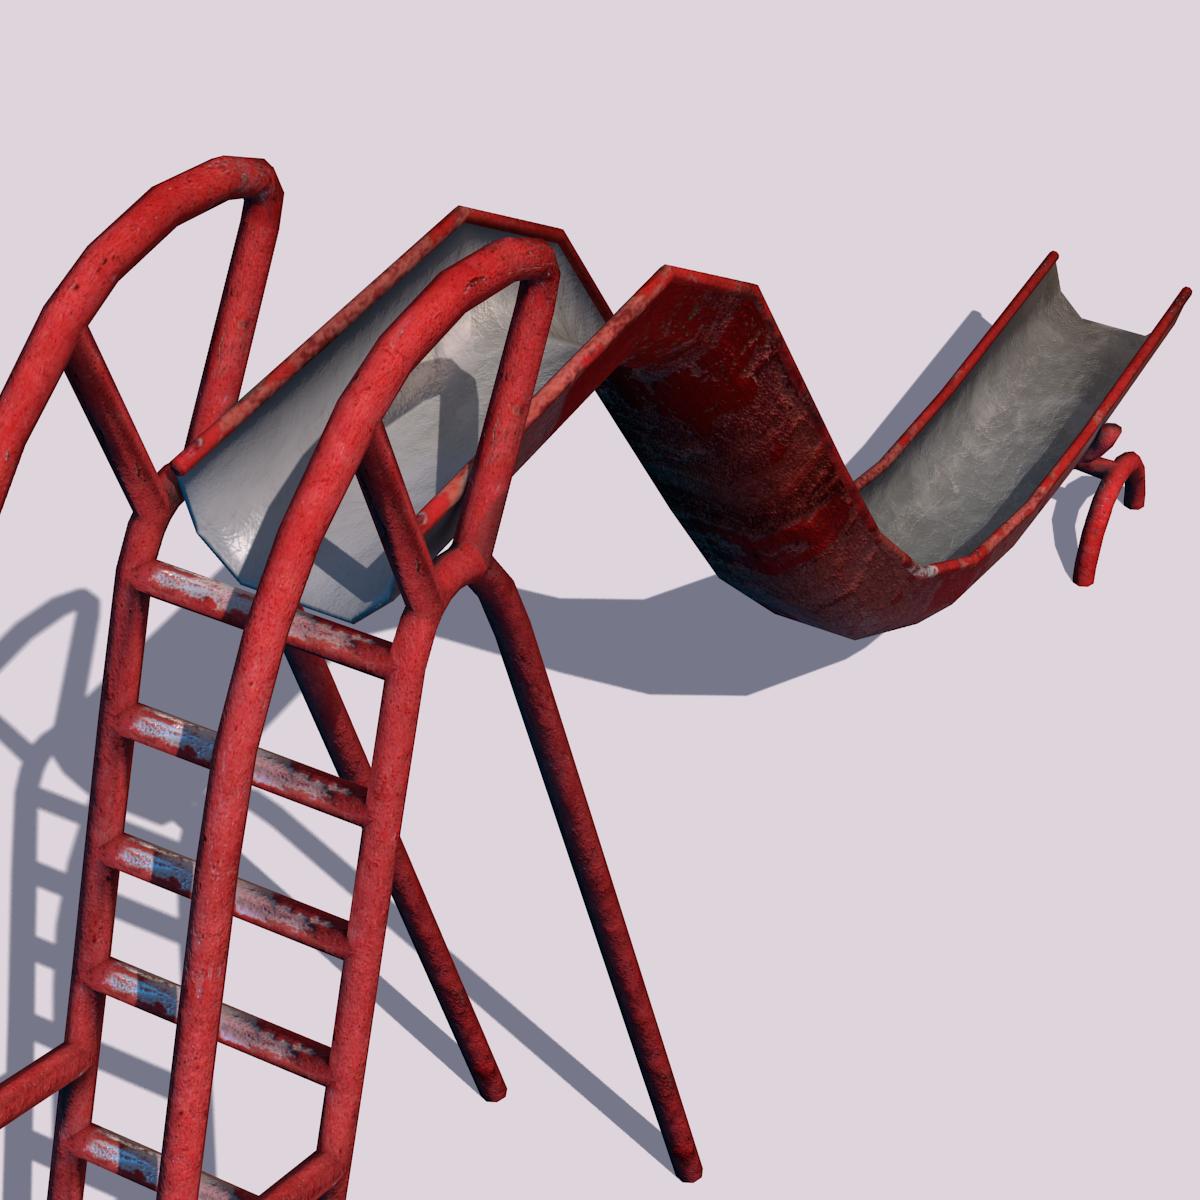 Old Playground Slide